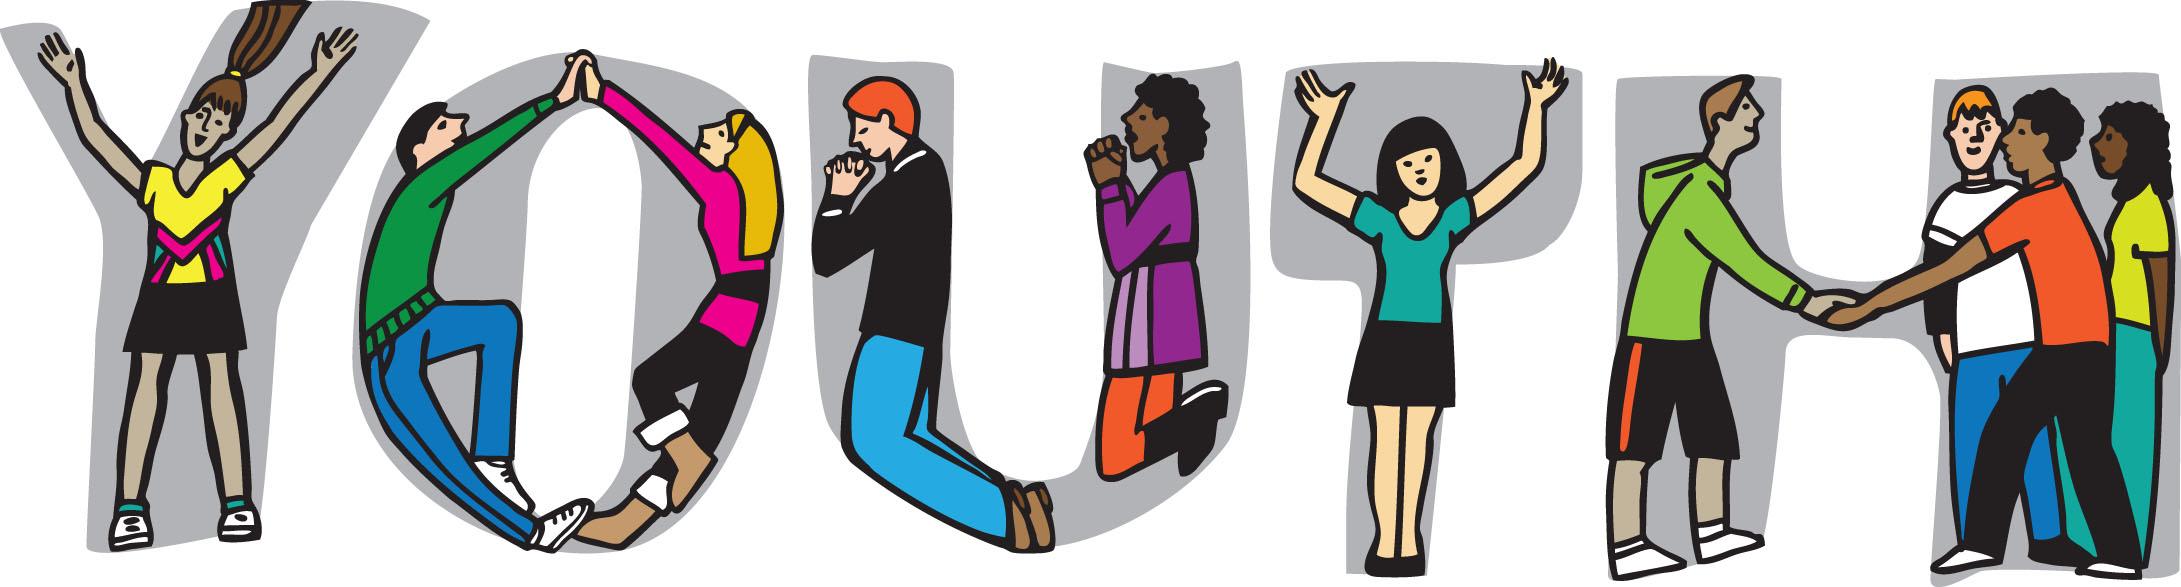 Youth Ministry Clip Art-Youth Ministry Clip Art-16